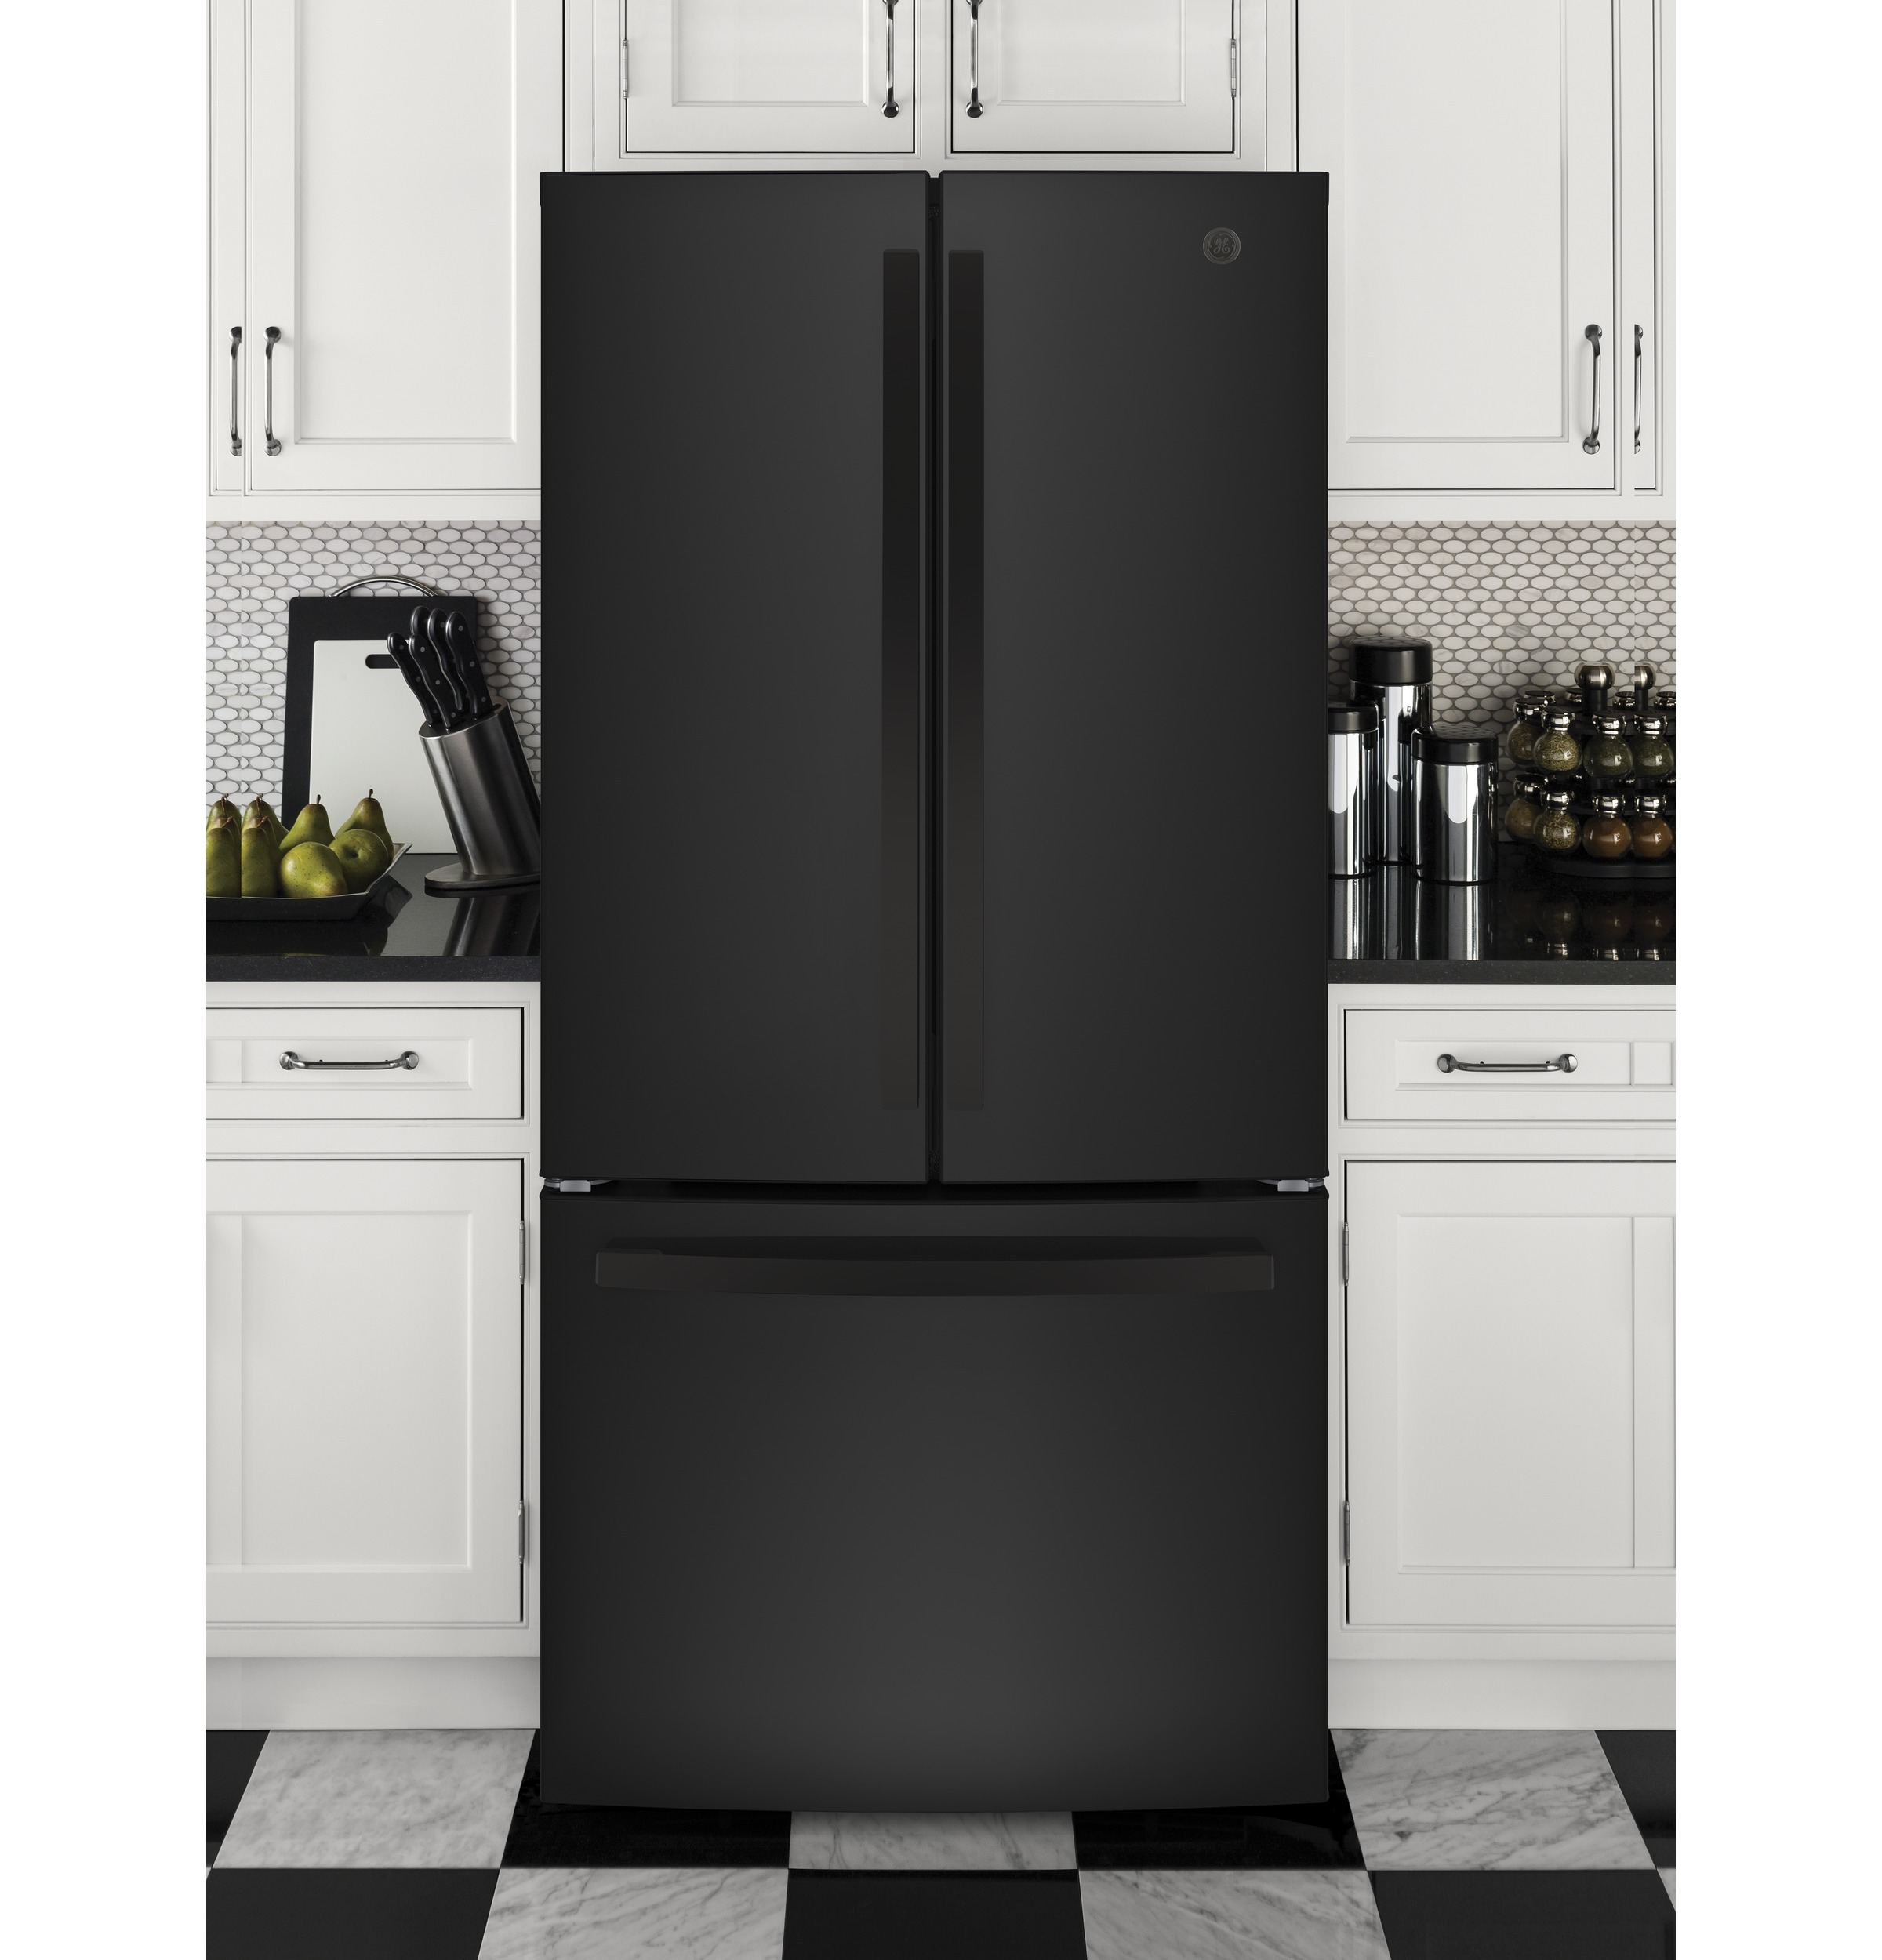 Model: GNE25JGKBB | GE GE® ENERGY STAR® 24.7 Cu. Ft. French-Door Refrigerator